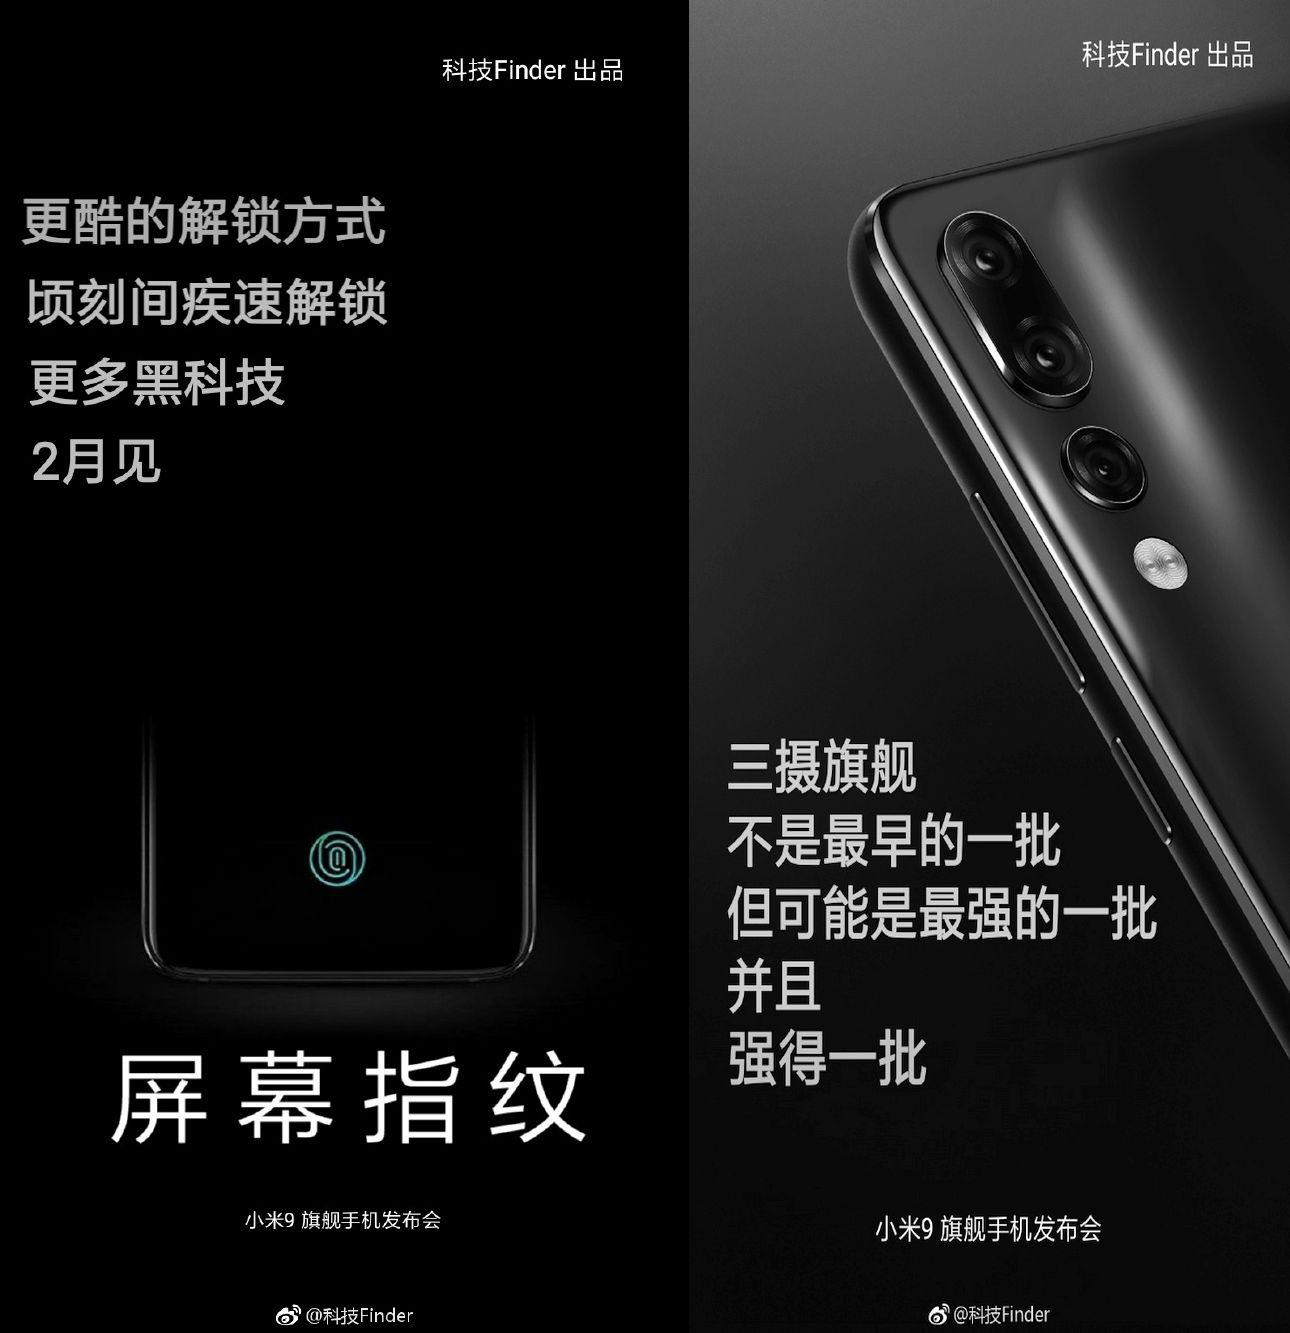 Xiaomi Mi 9 February launch rumor said